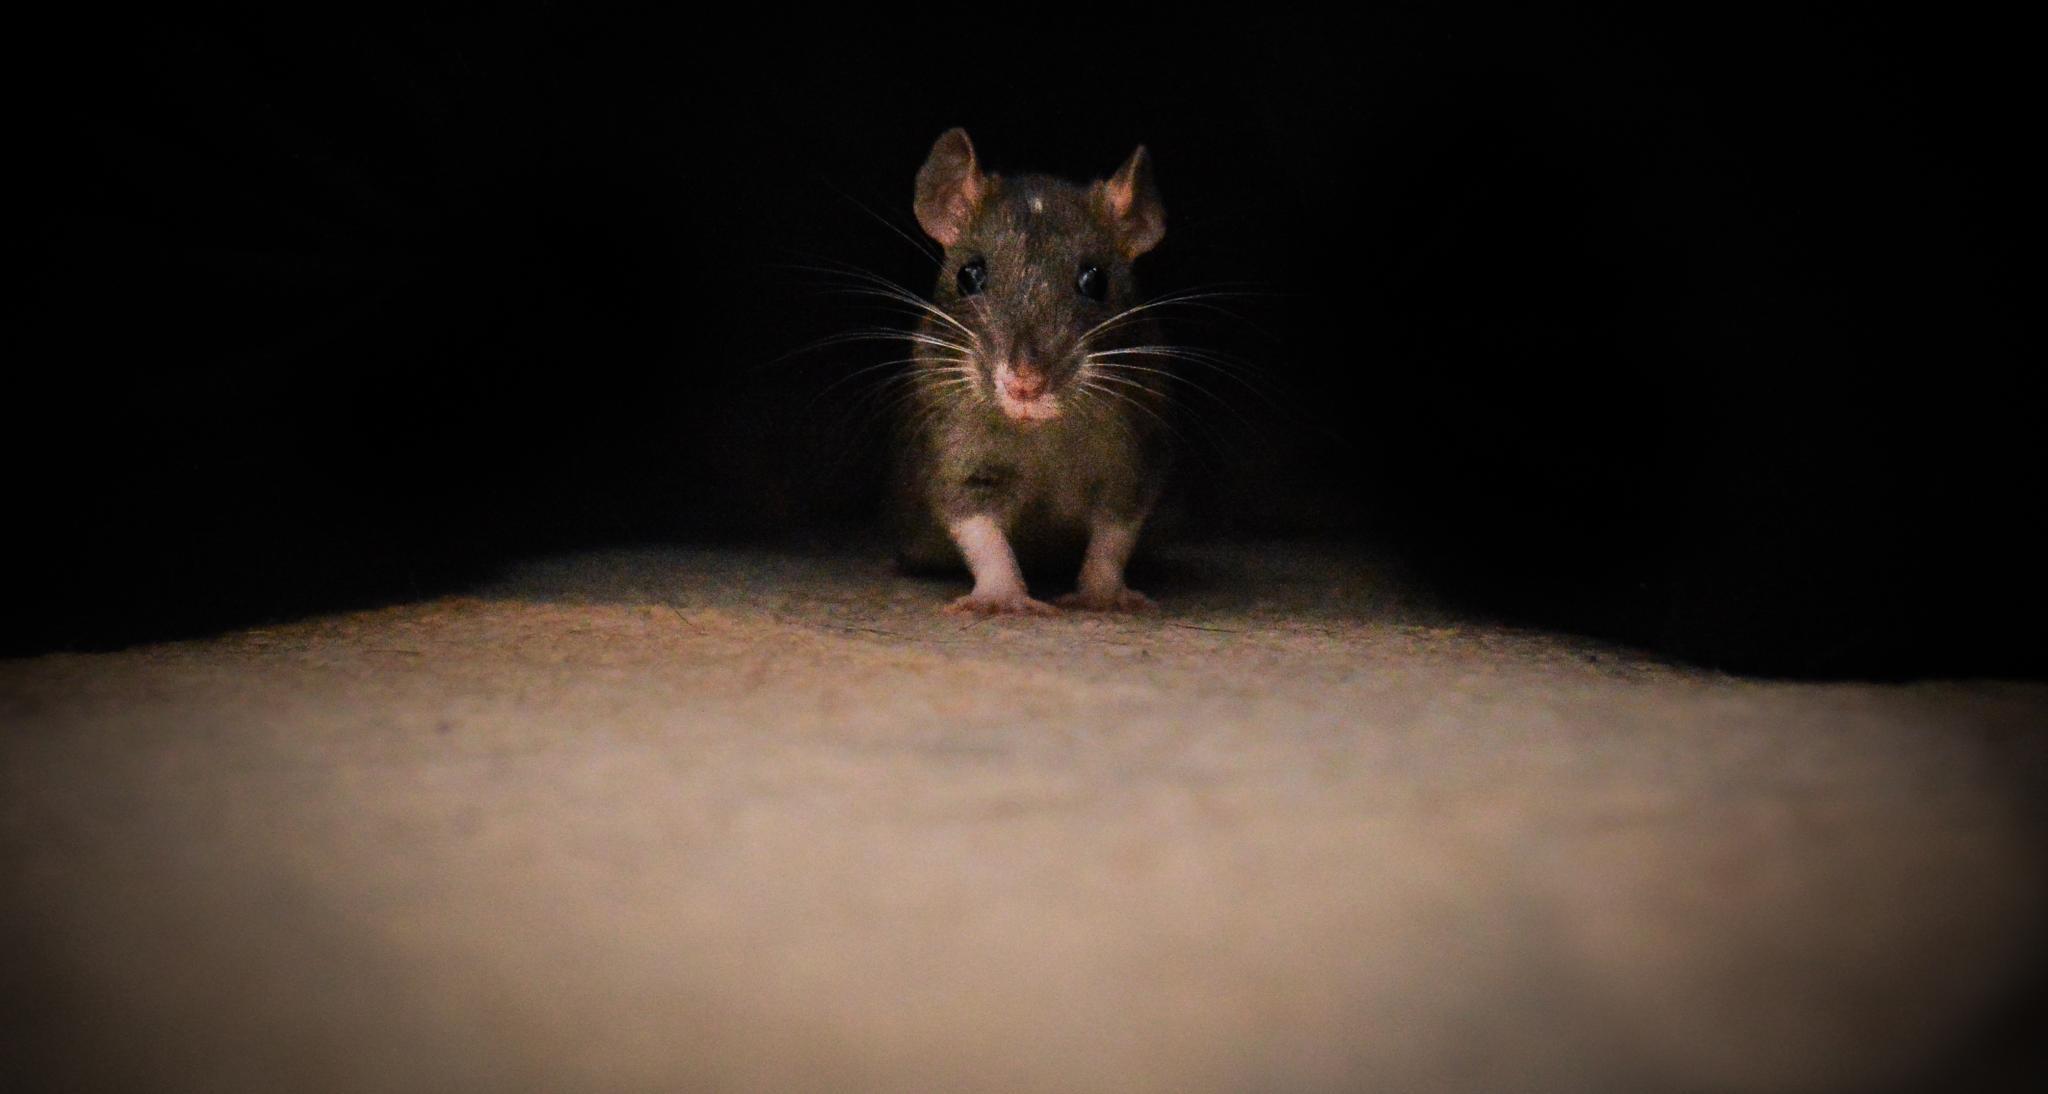 Pet rat by Emma Jade